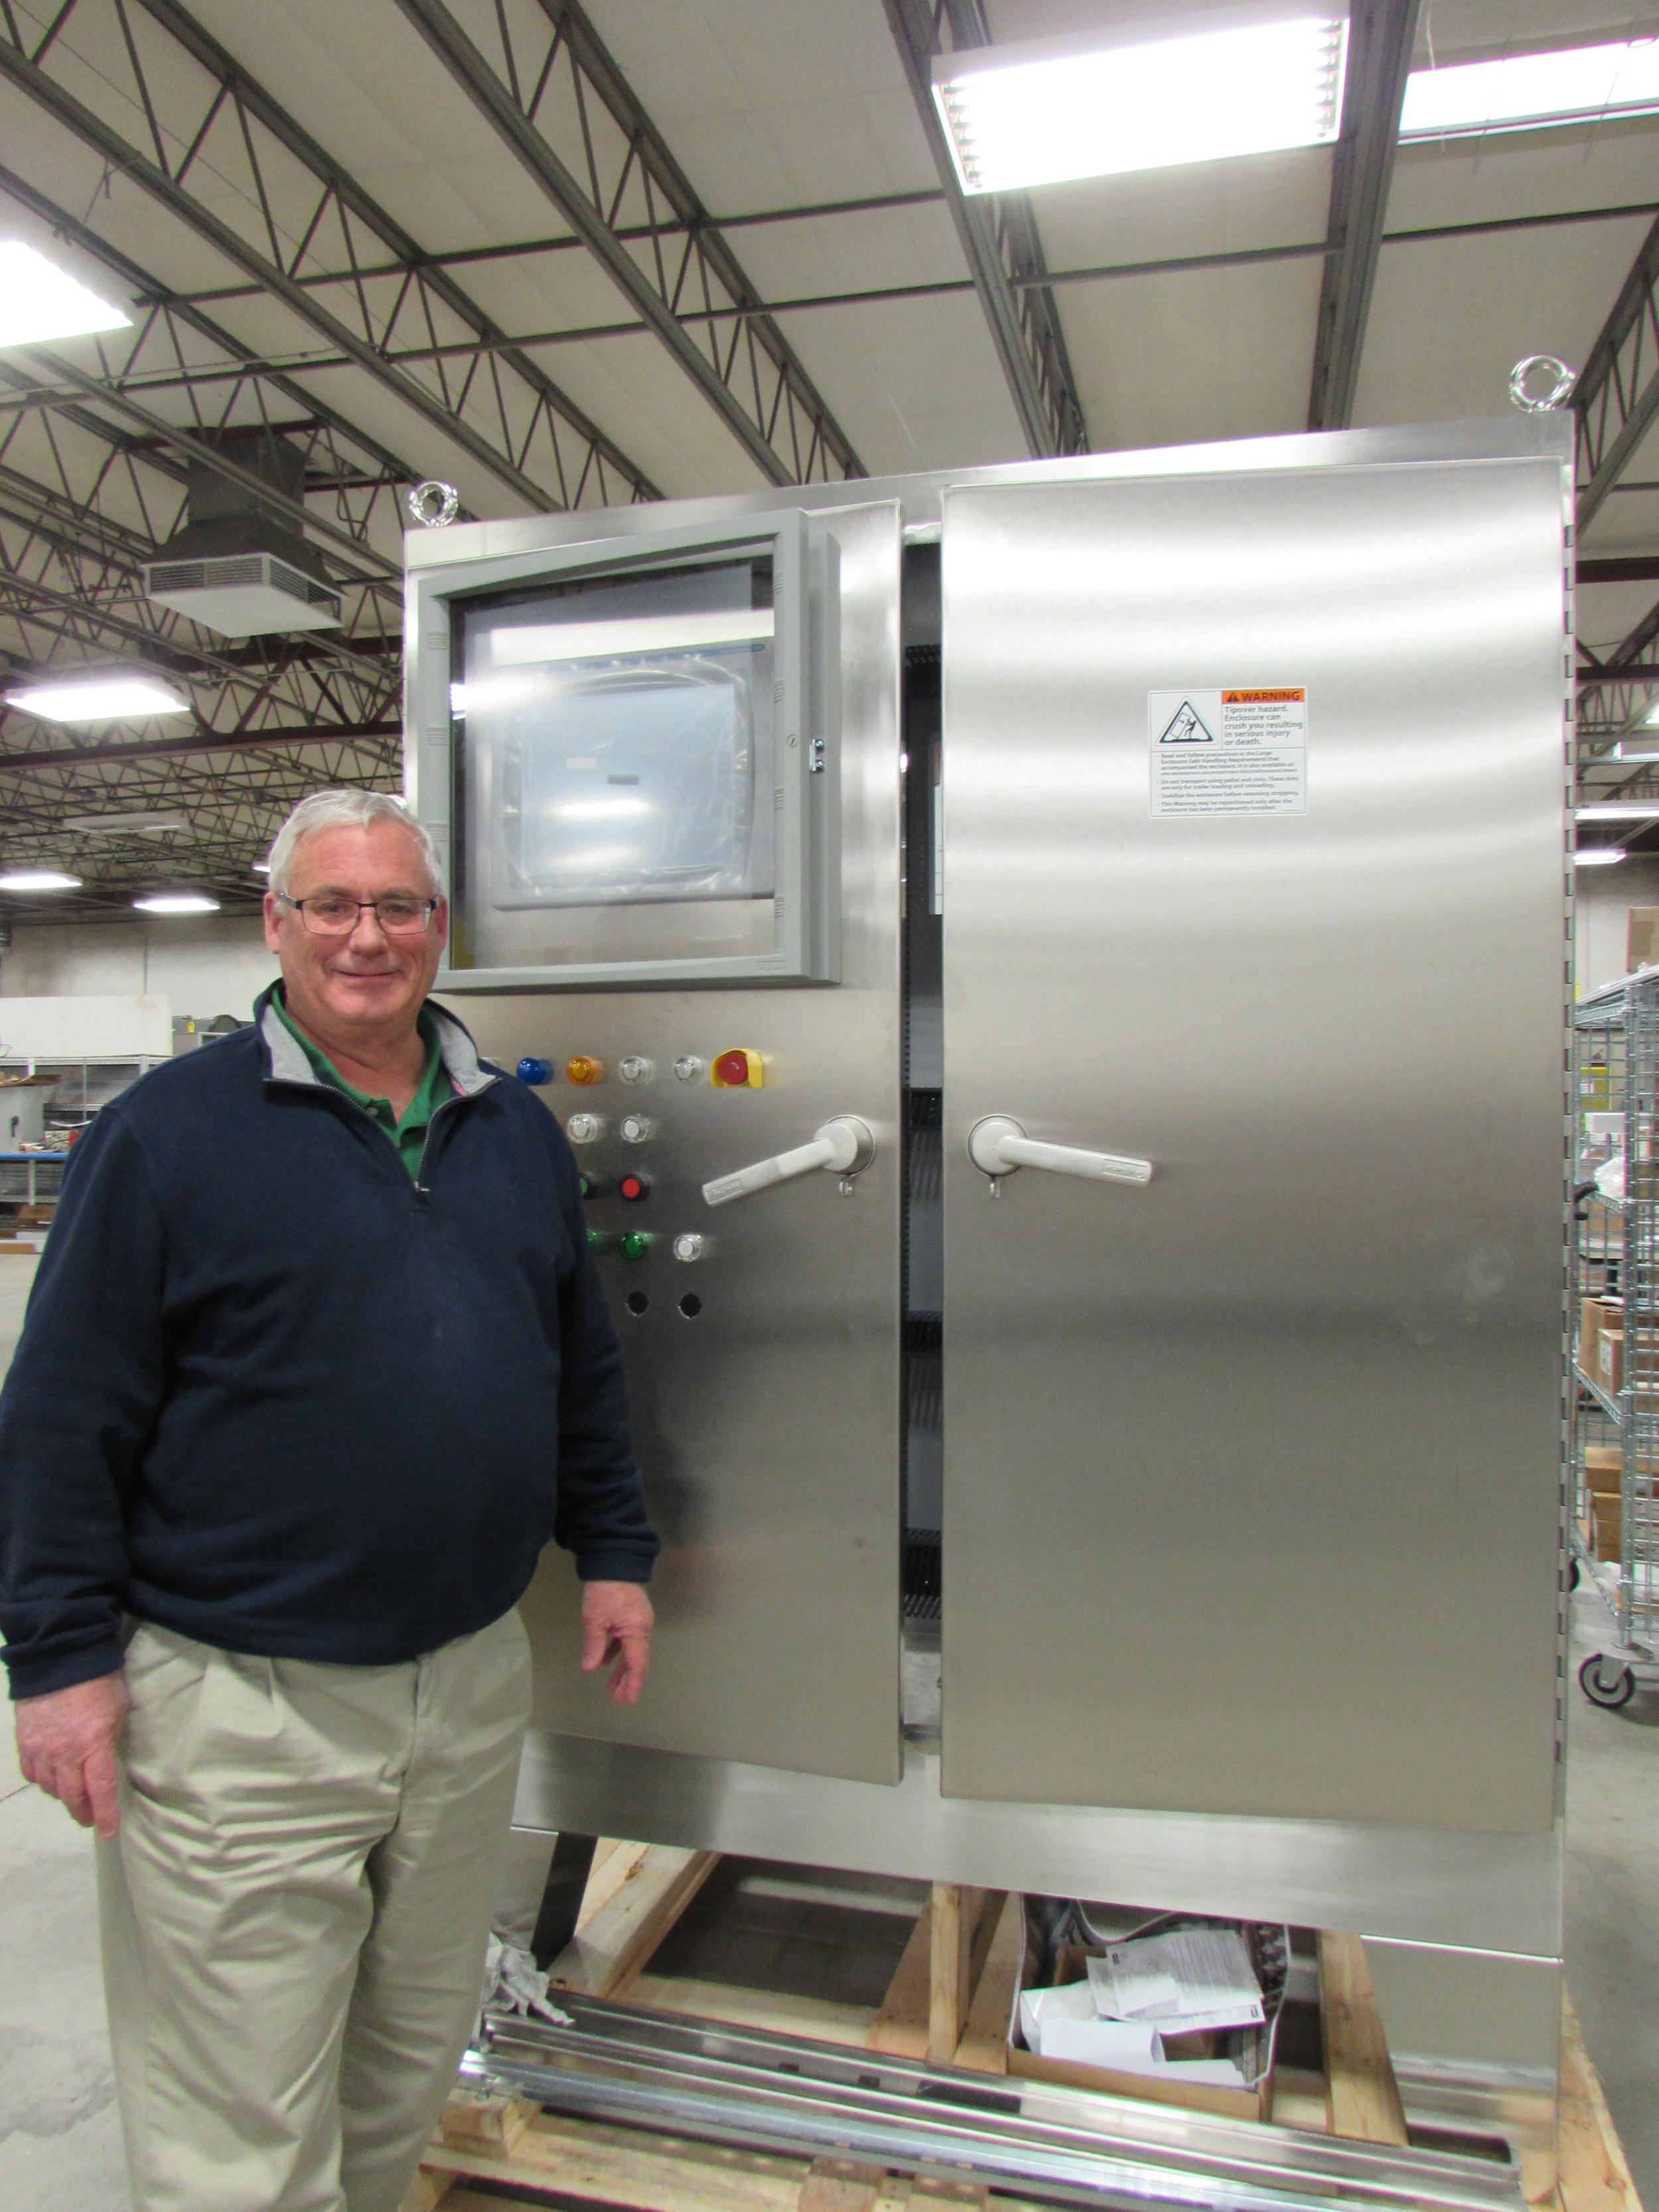 John Quinn standing next to a Hoffman stainless steel enclosure.